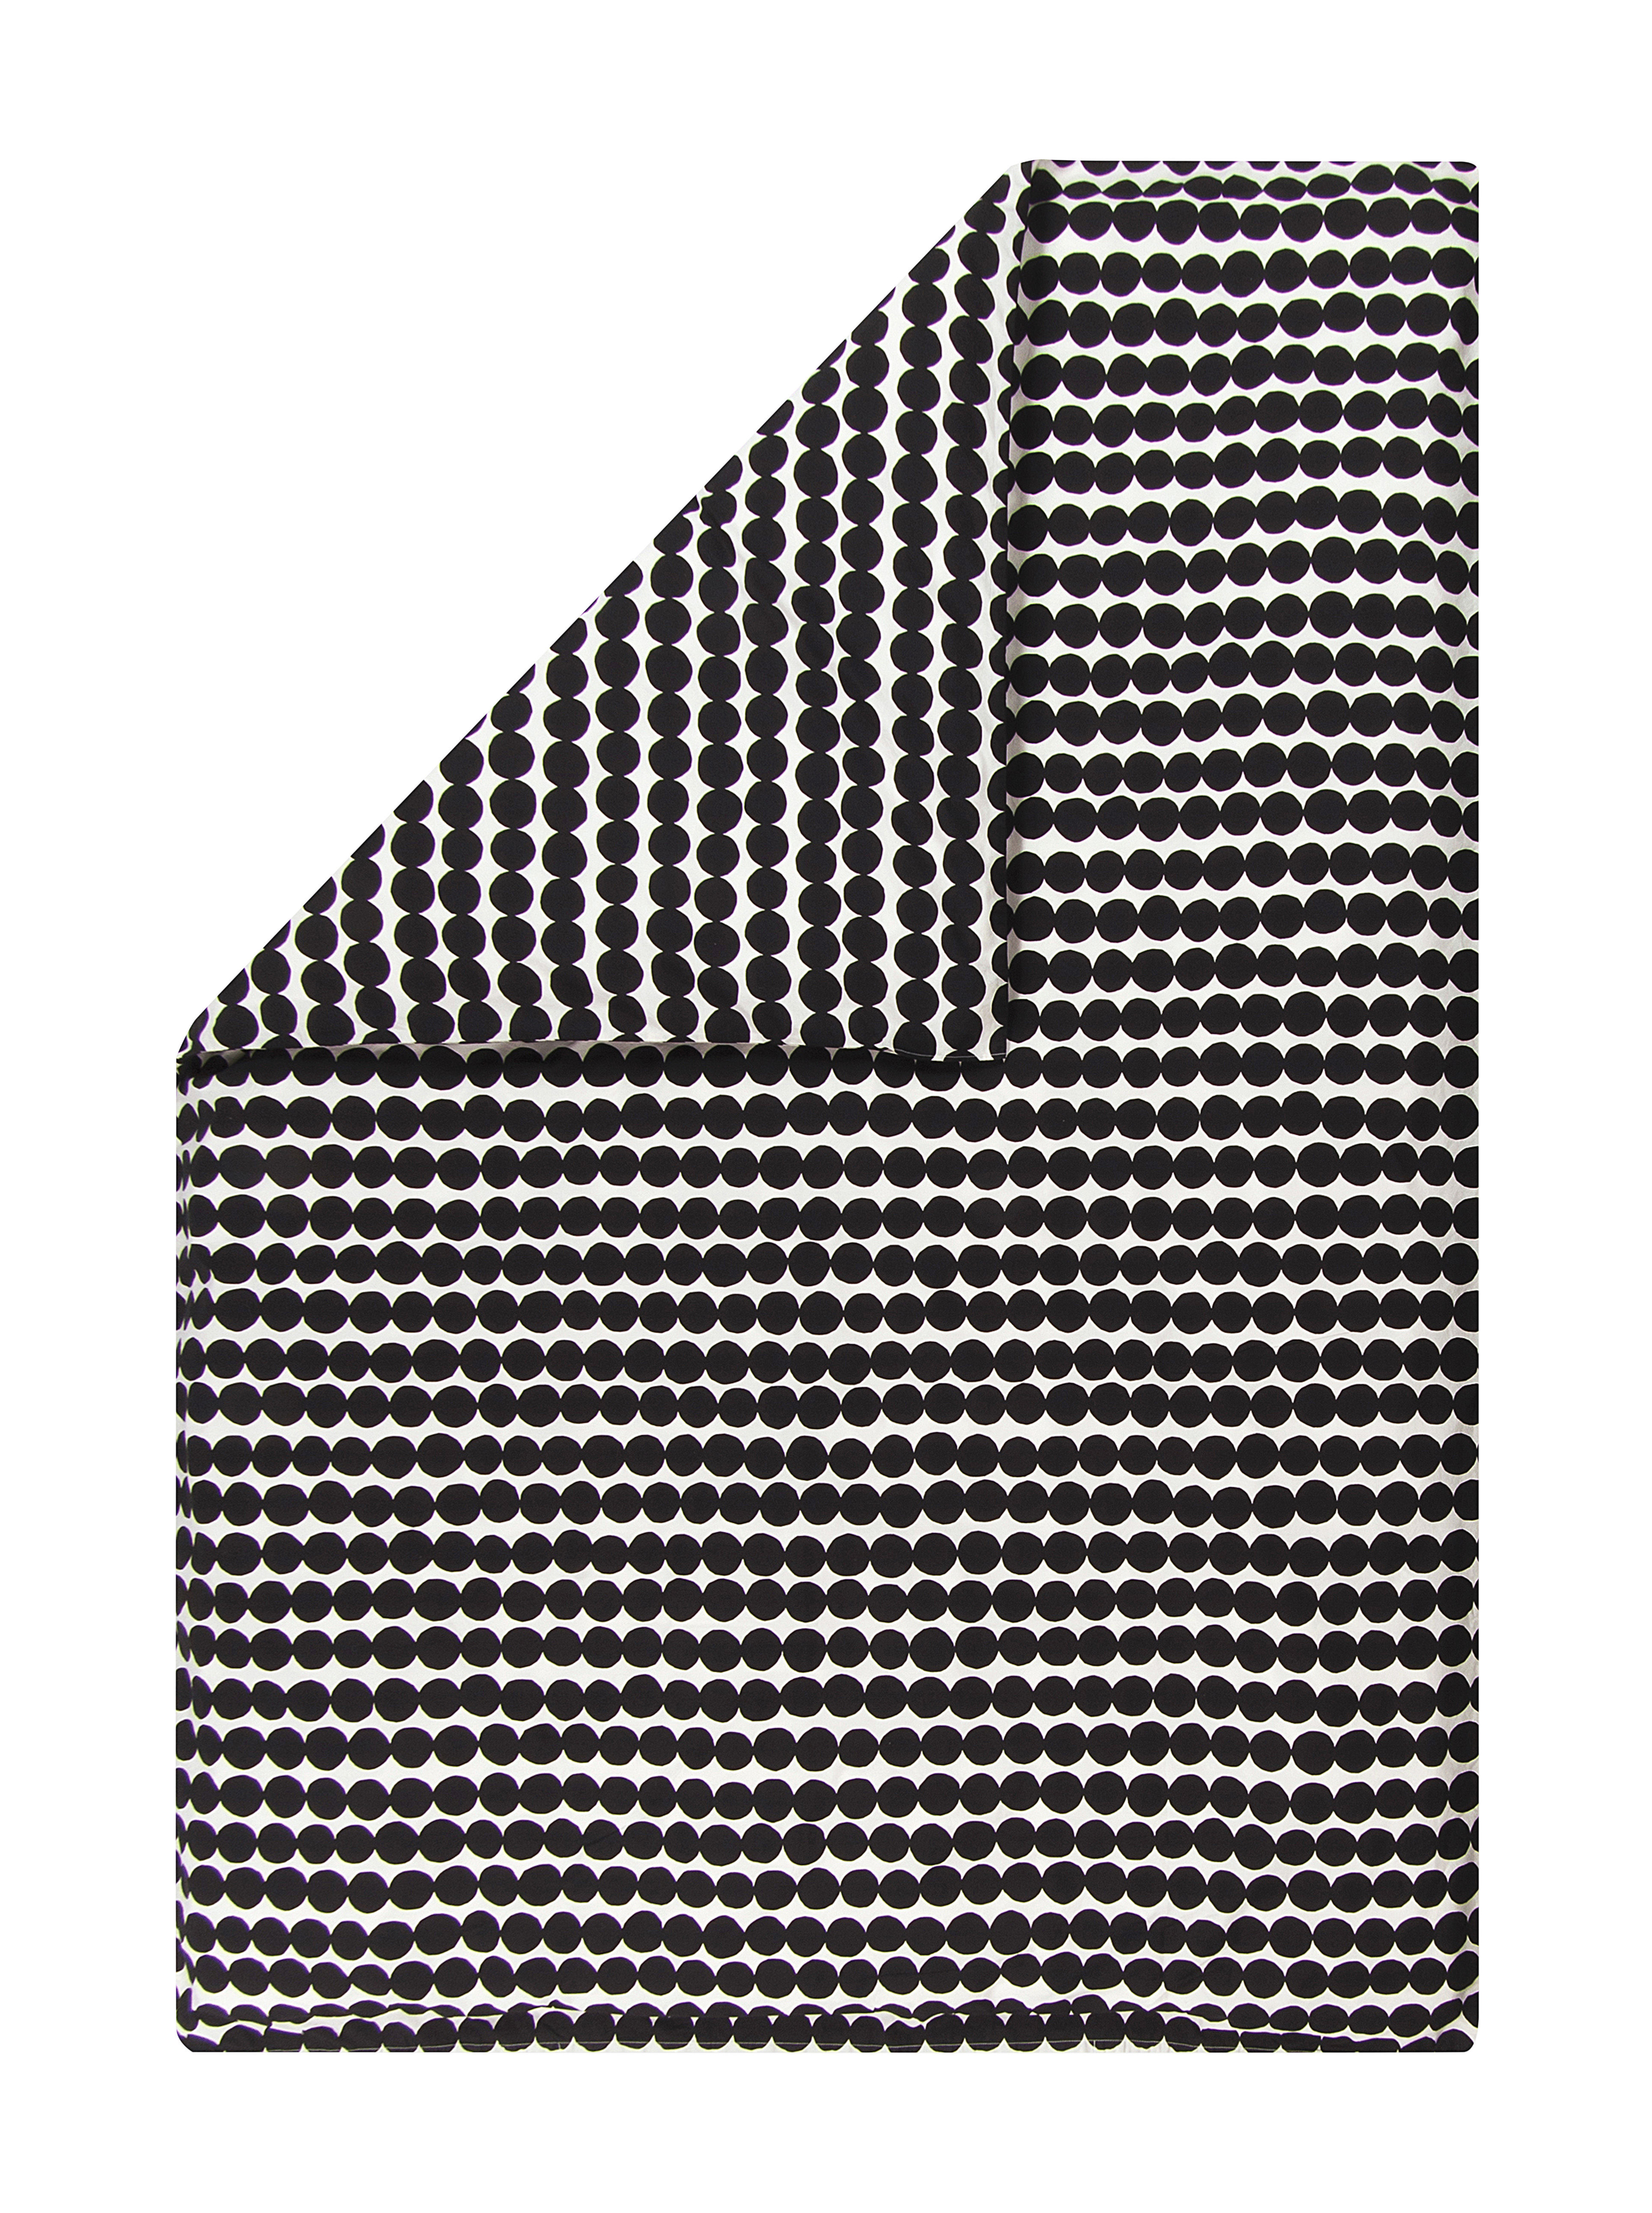 Decoration - Bedding & Bath Towels - Räsymatto duvet cover - / 240 x 220 cm by Marimekko - Räsymatto / Black & white - Cotton